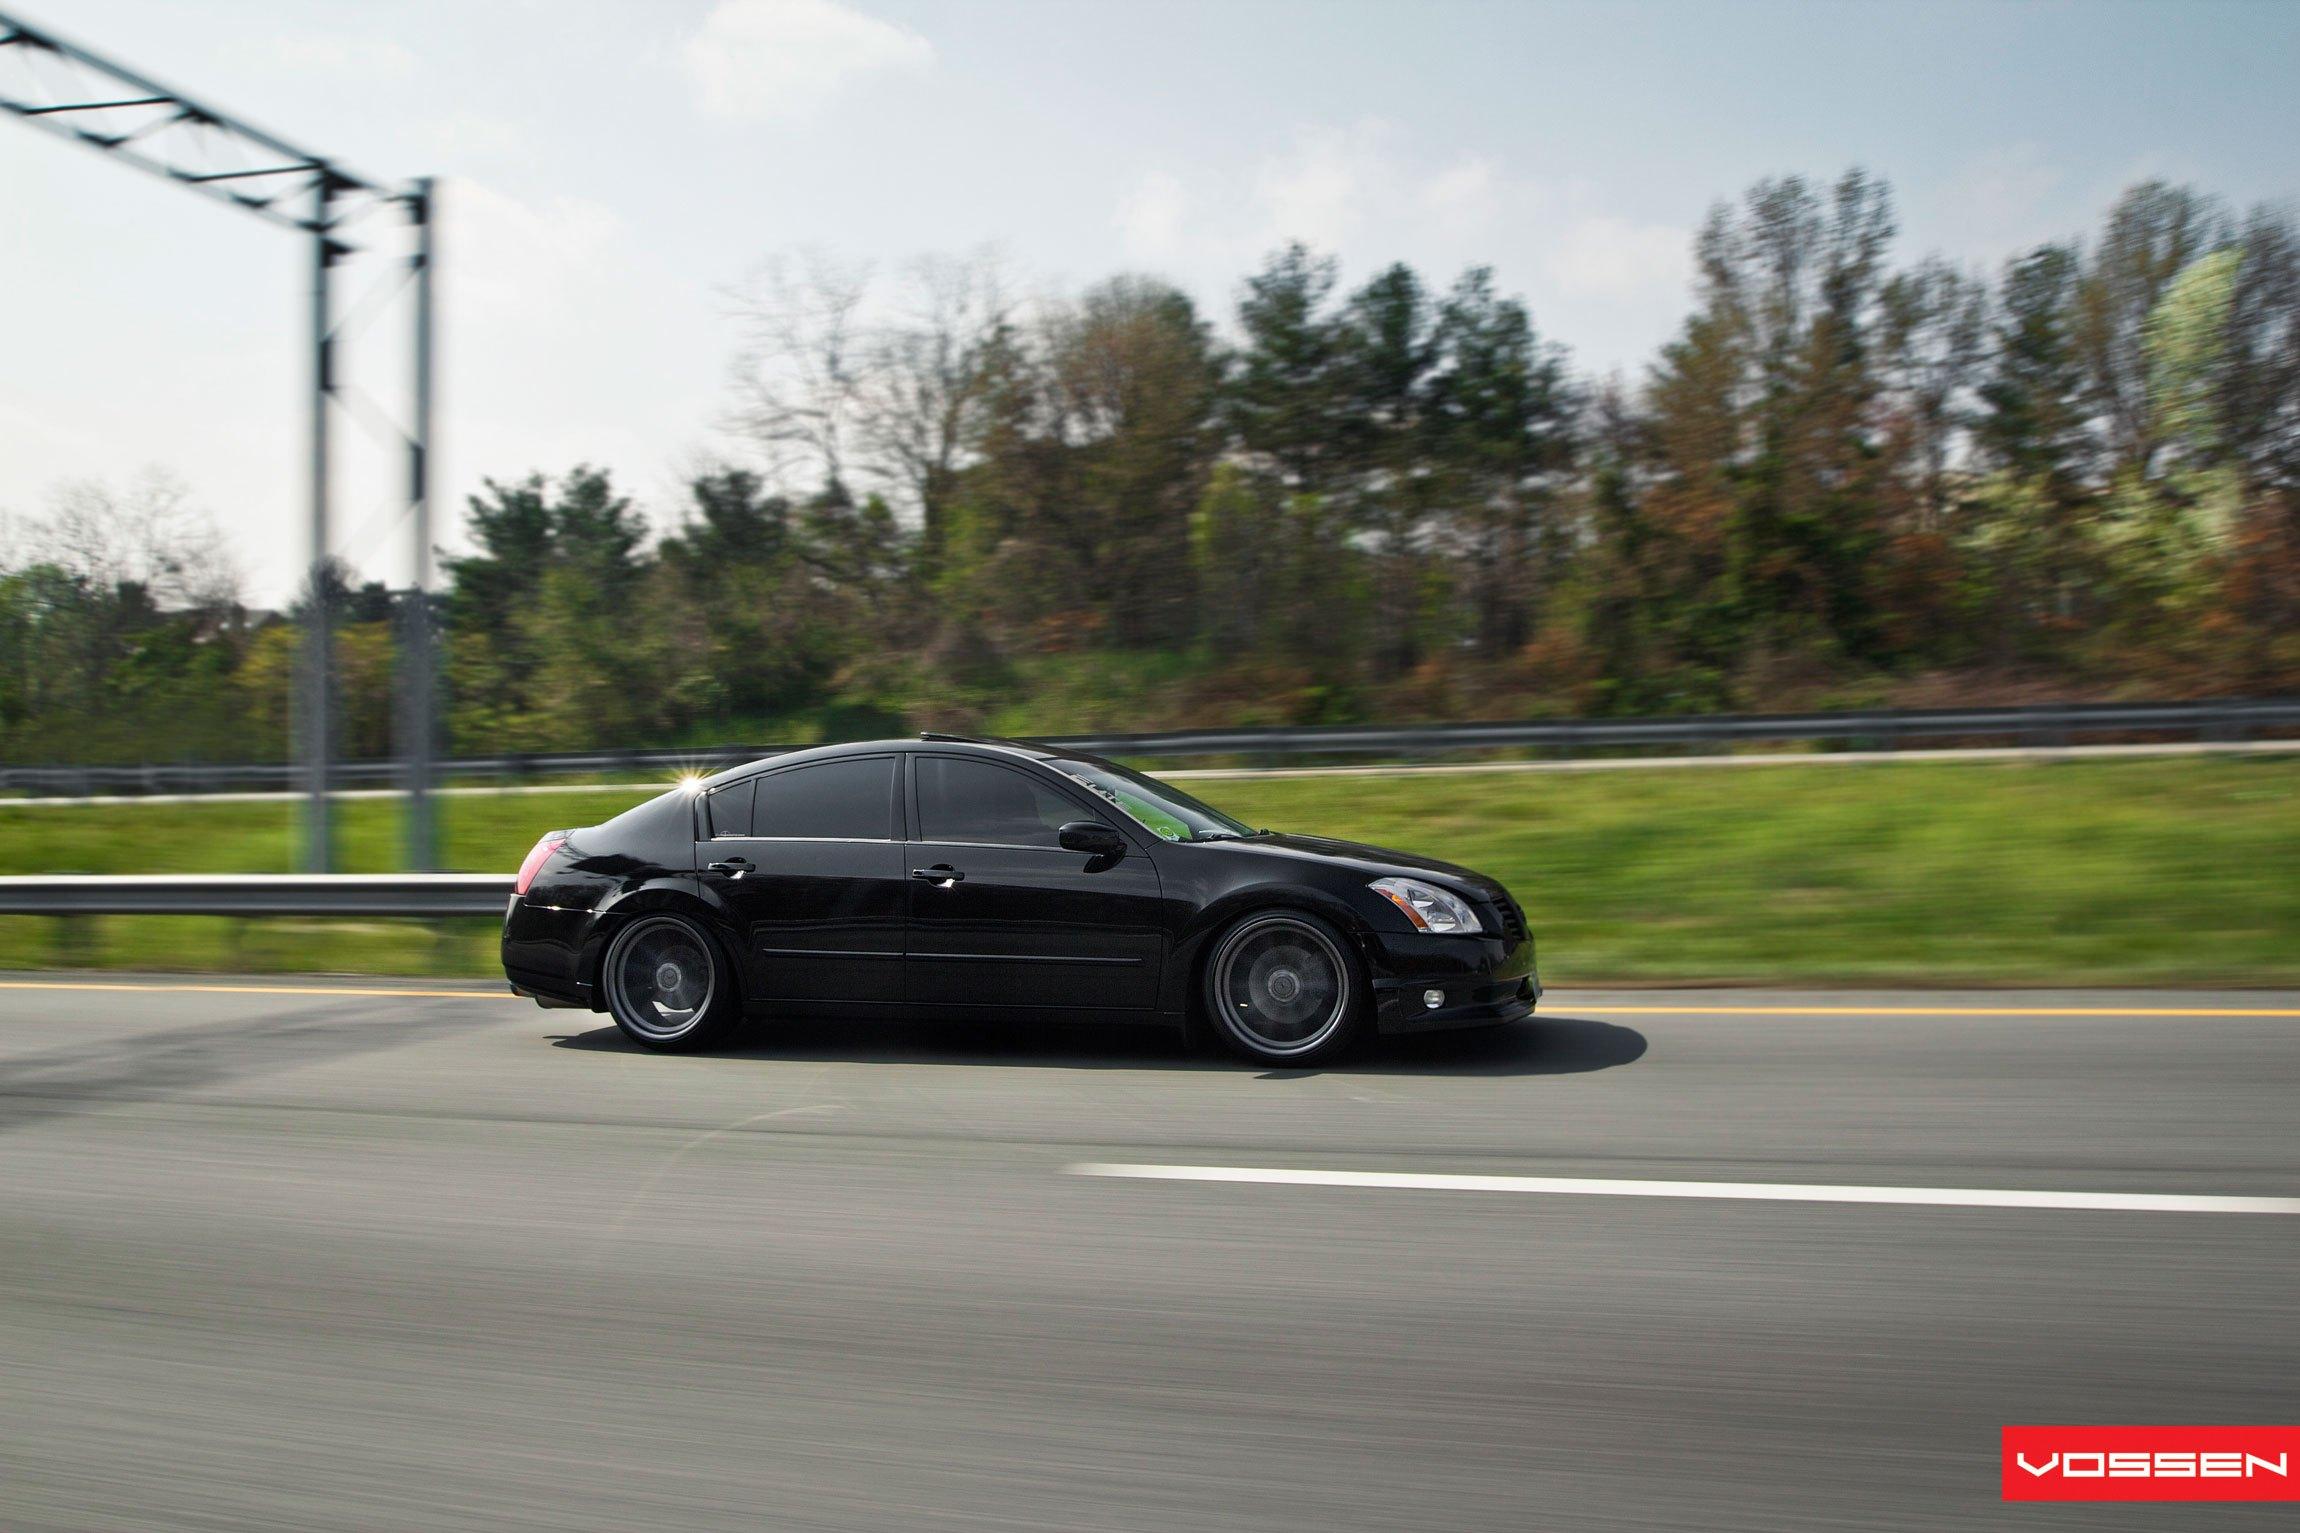 Stanced Nissan Maxima Enhanced With Stylish Custom Wheels